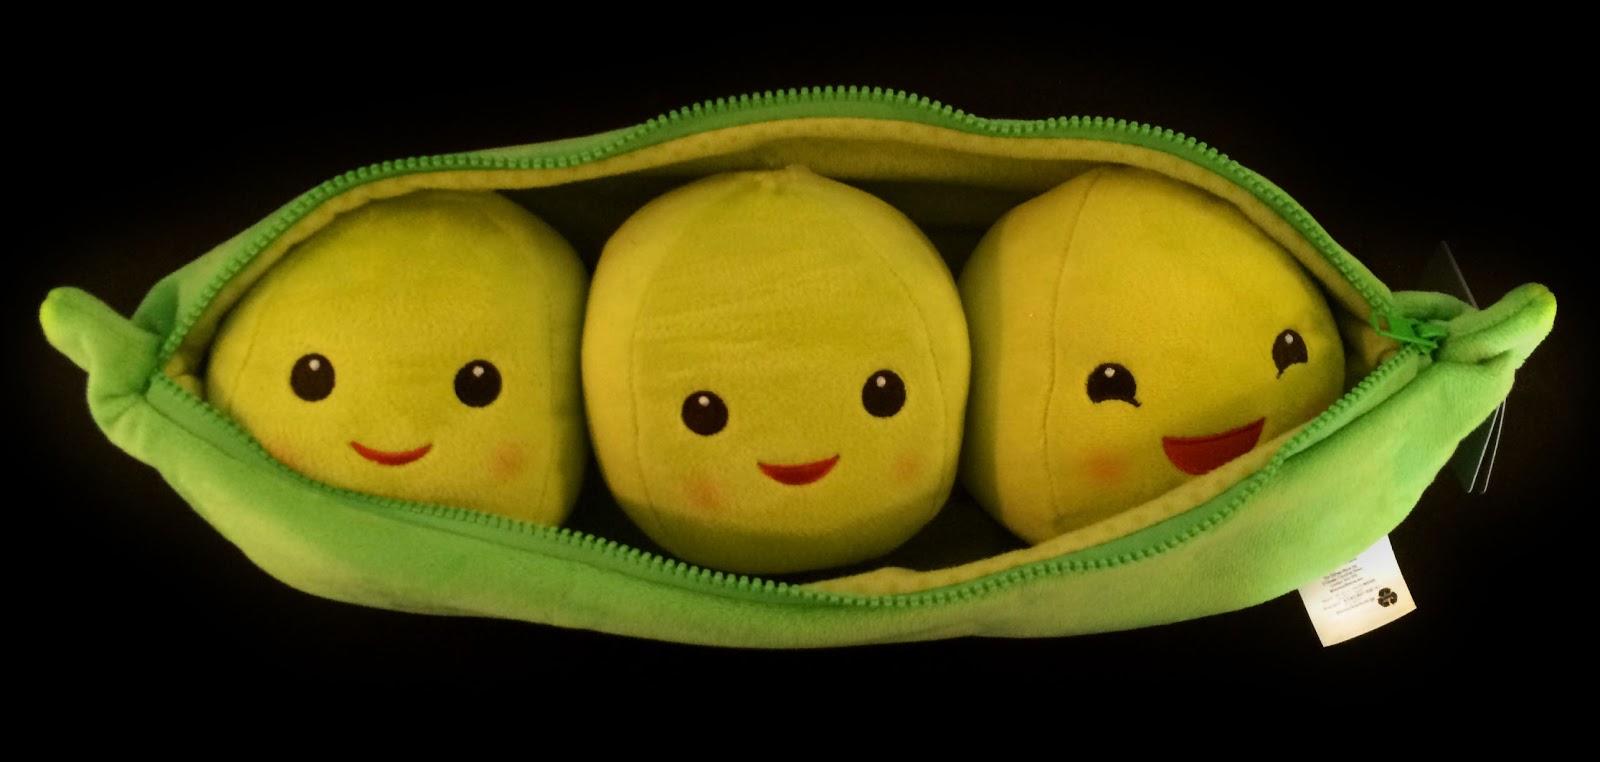 Dan the pixar fan toy story 3 peas in a pod plush 19 quot